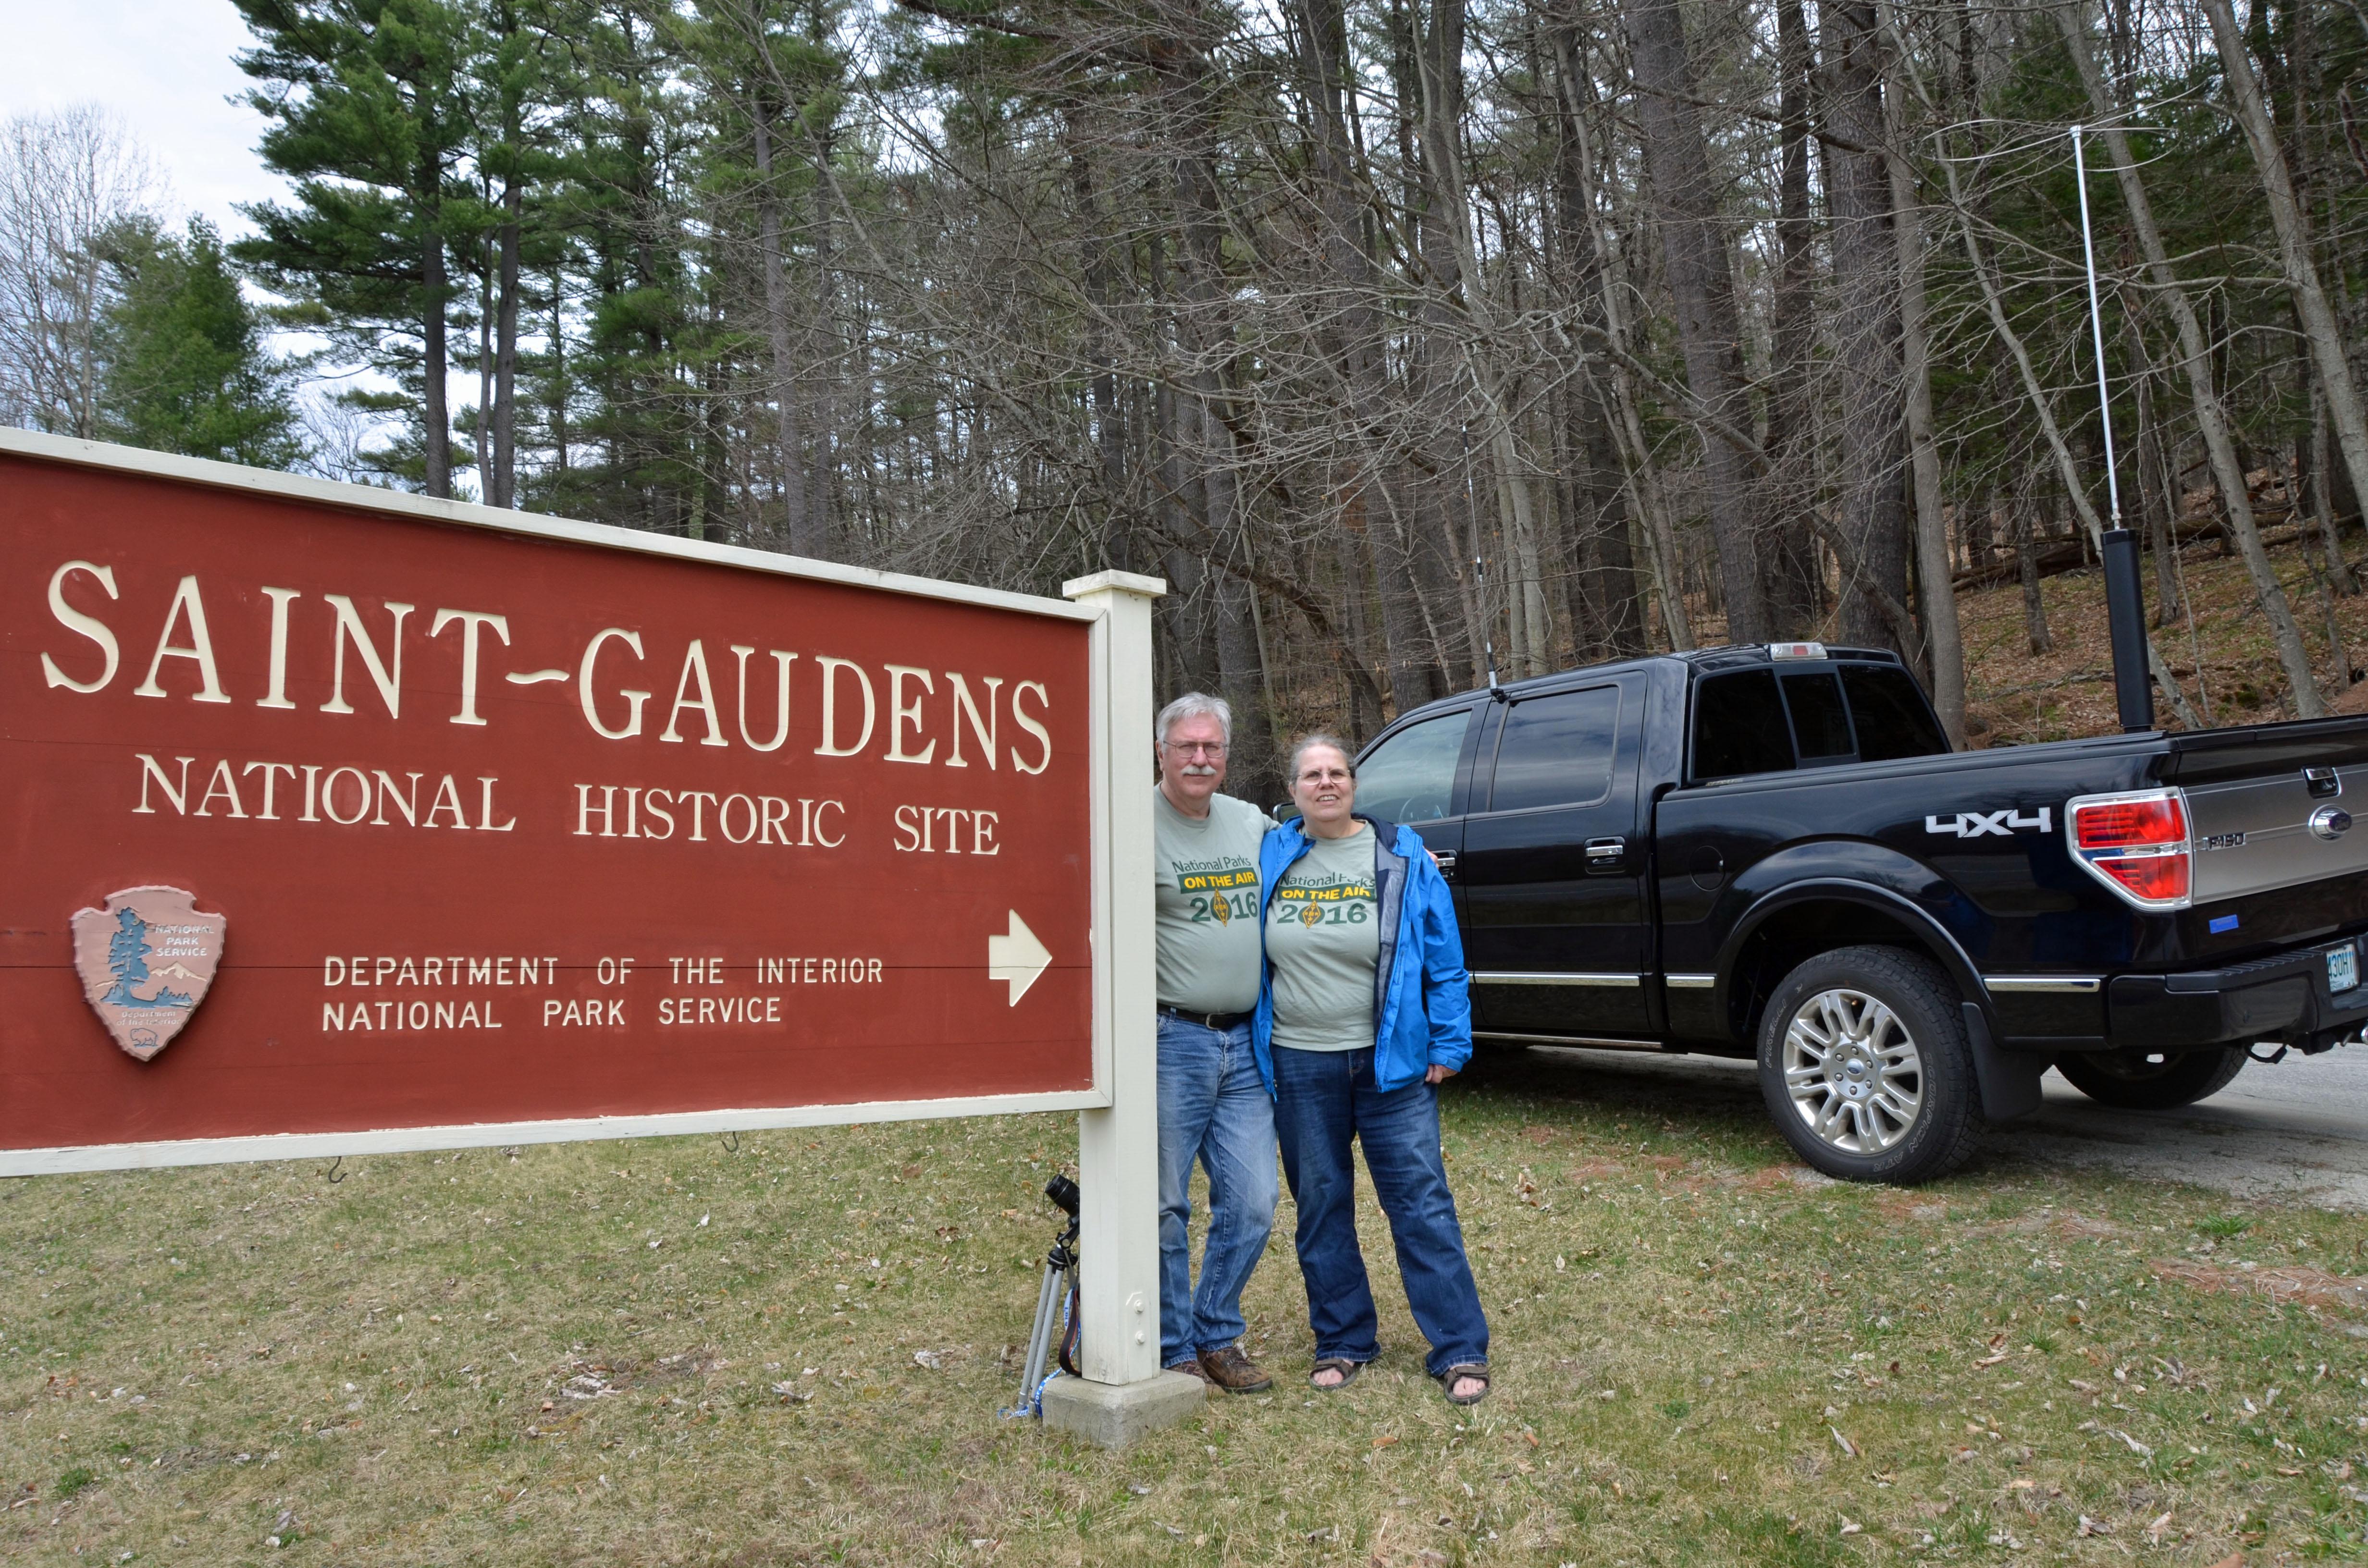 Aron W1AKI and Merle W1MSI At Saint-Gardens NHS